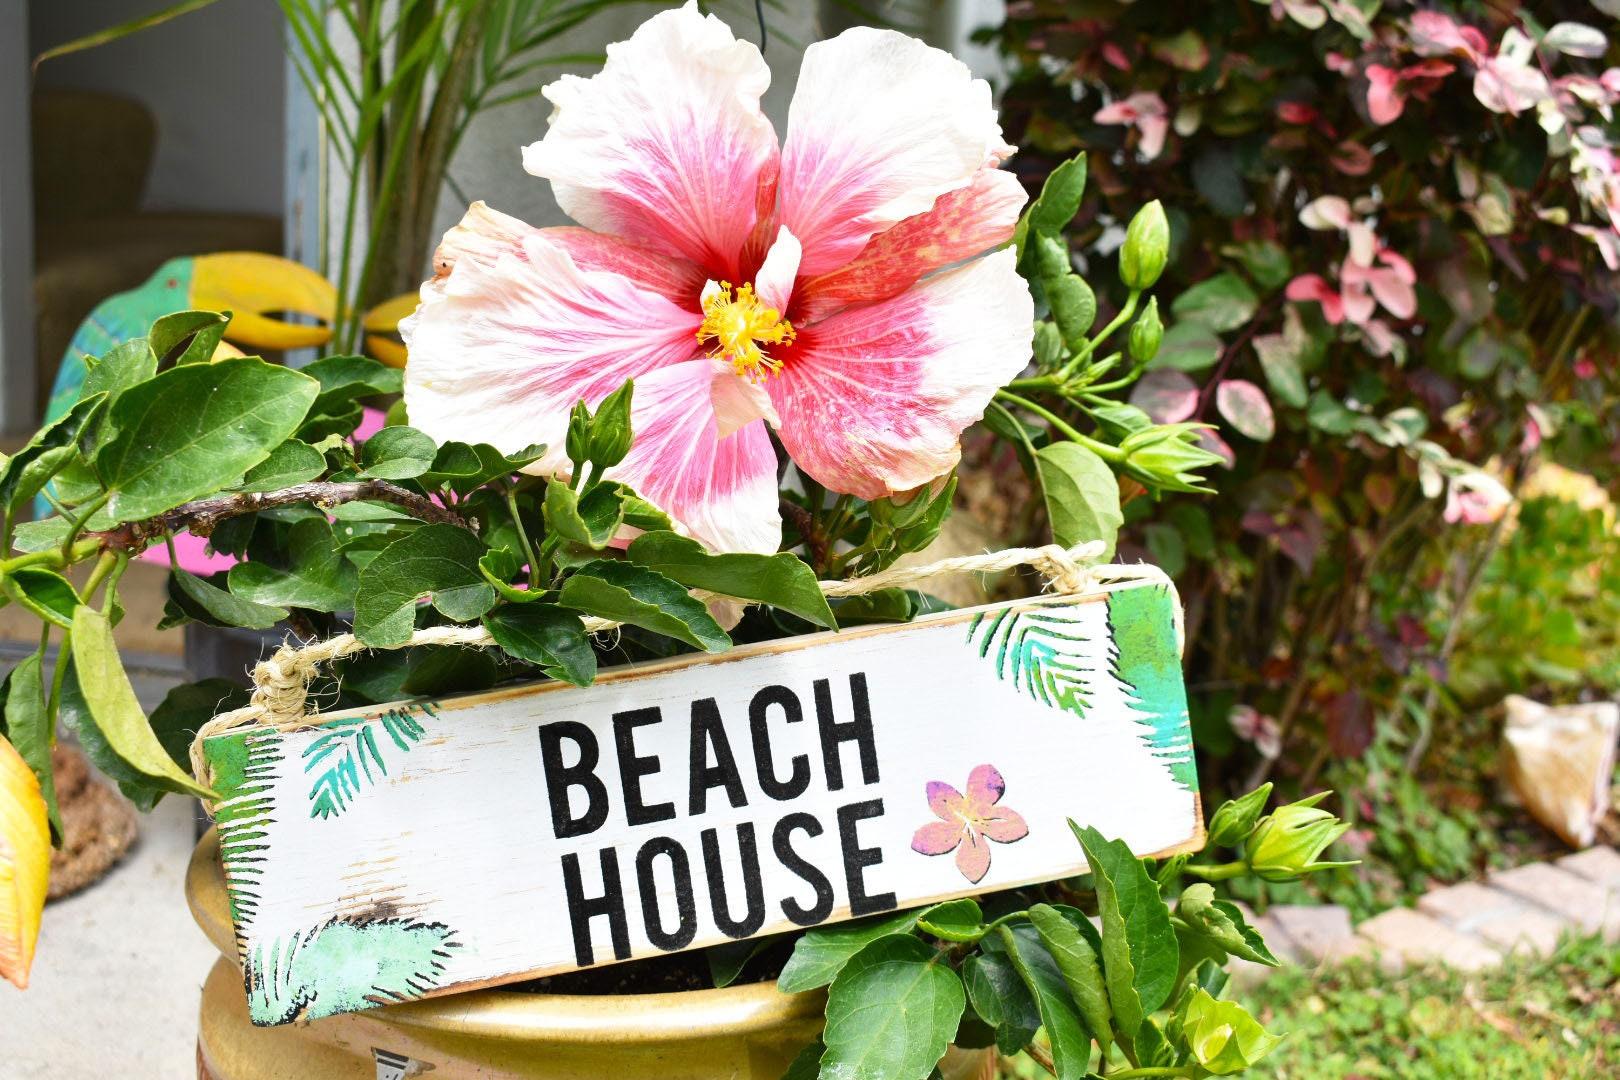 Beach house sign beach house decor beach signs wholesale home beach house sign beach house decor beach signs wholesale home decor sea gypsy signs izmirmasajfo